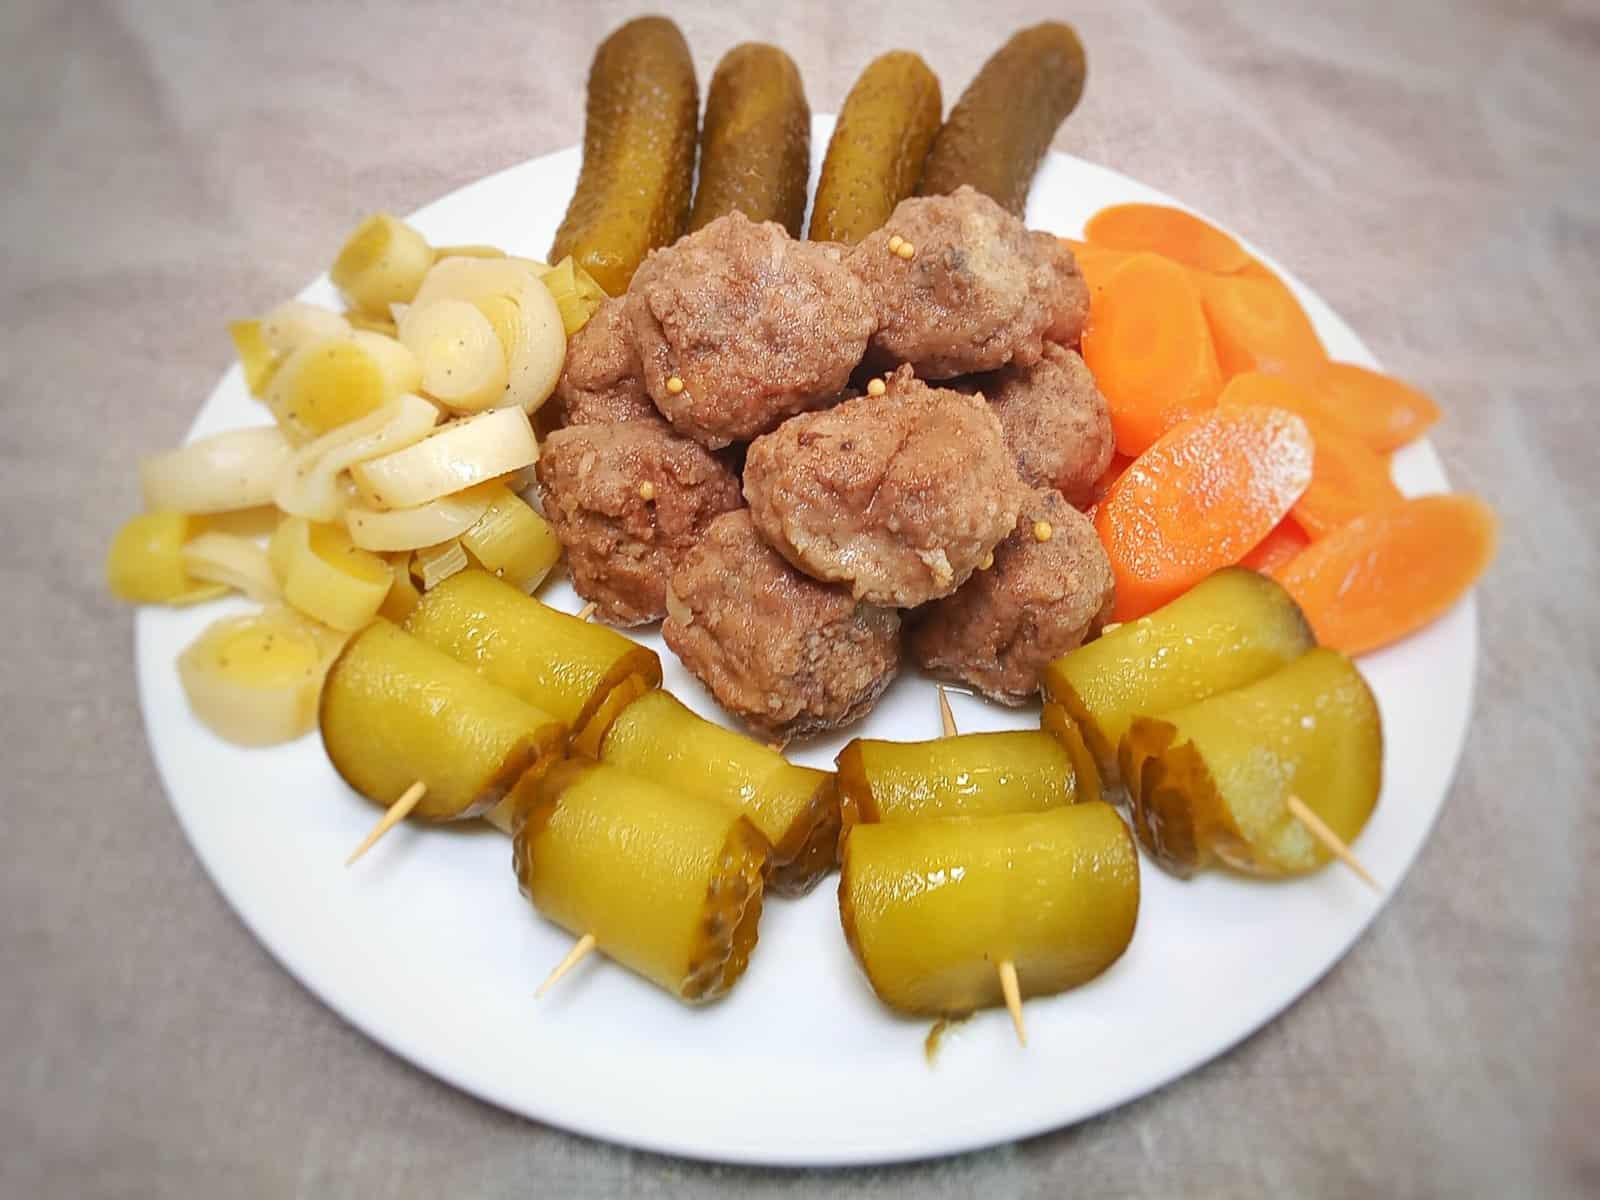 Bratheringsröllchen und süß-sauren Antipasti